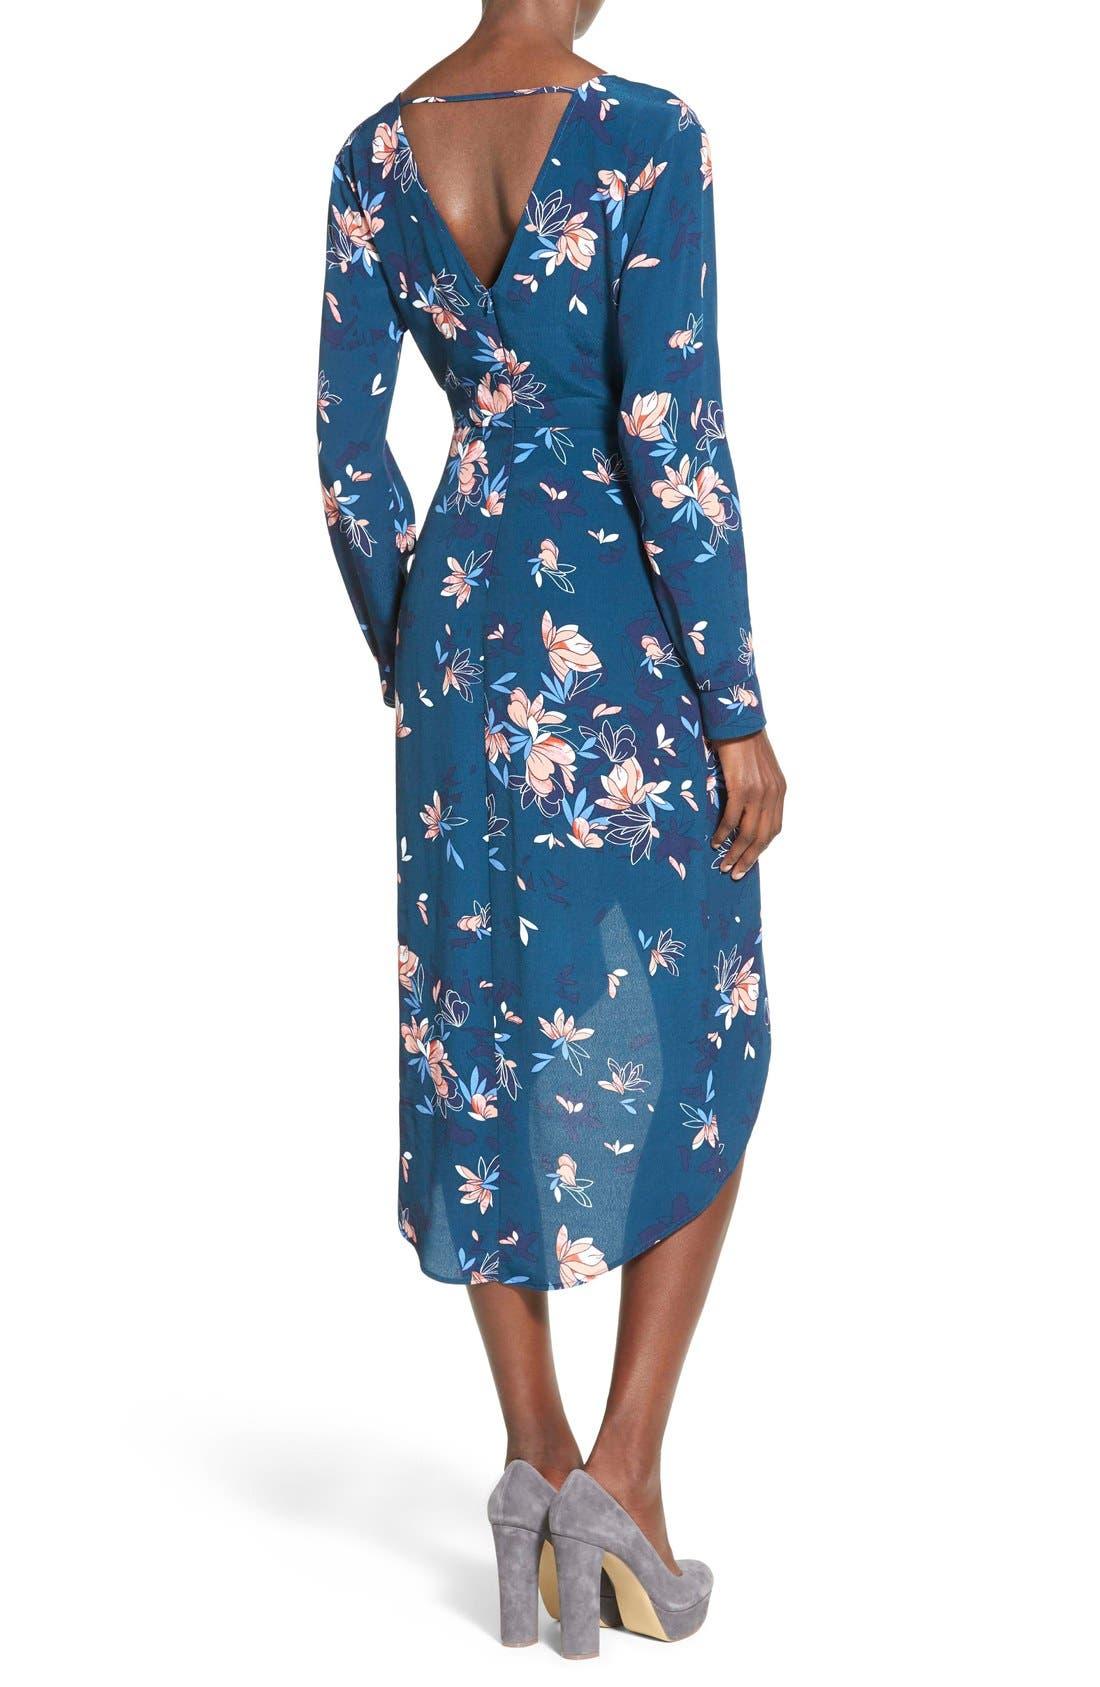 ASTR Wrap Front High/Low Dress,                             Alternate thumbnail 2, color,                             Teal Multi Floral